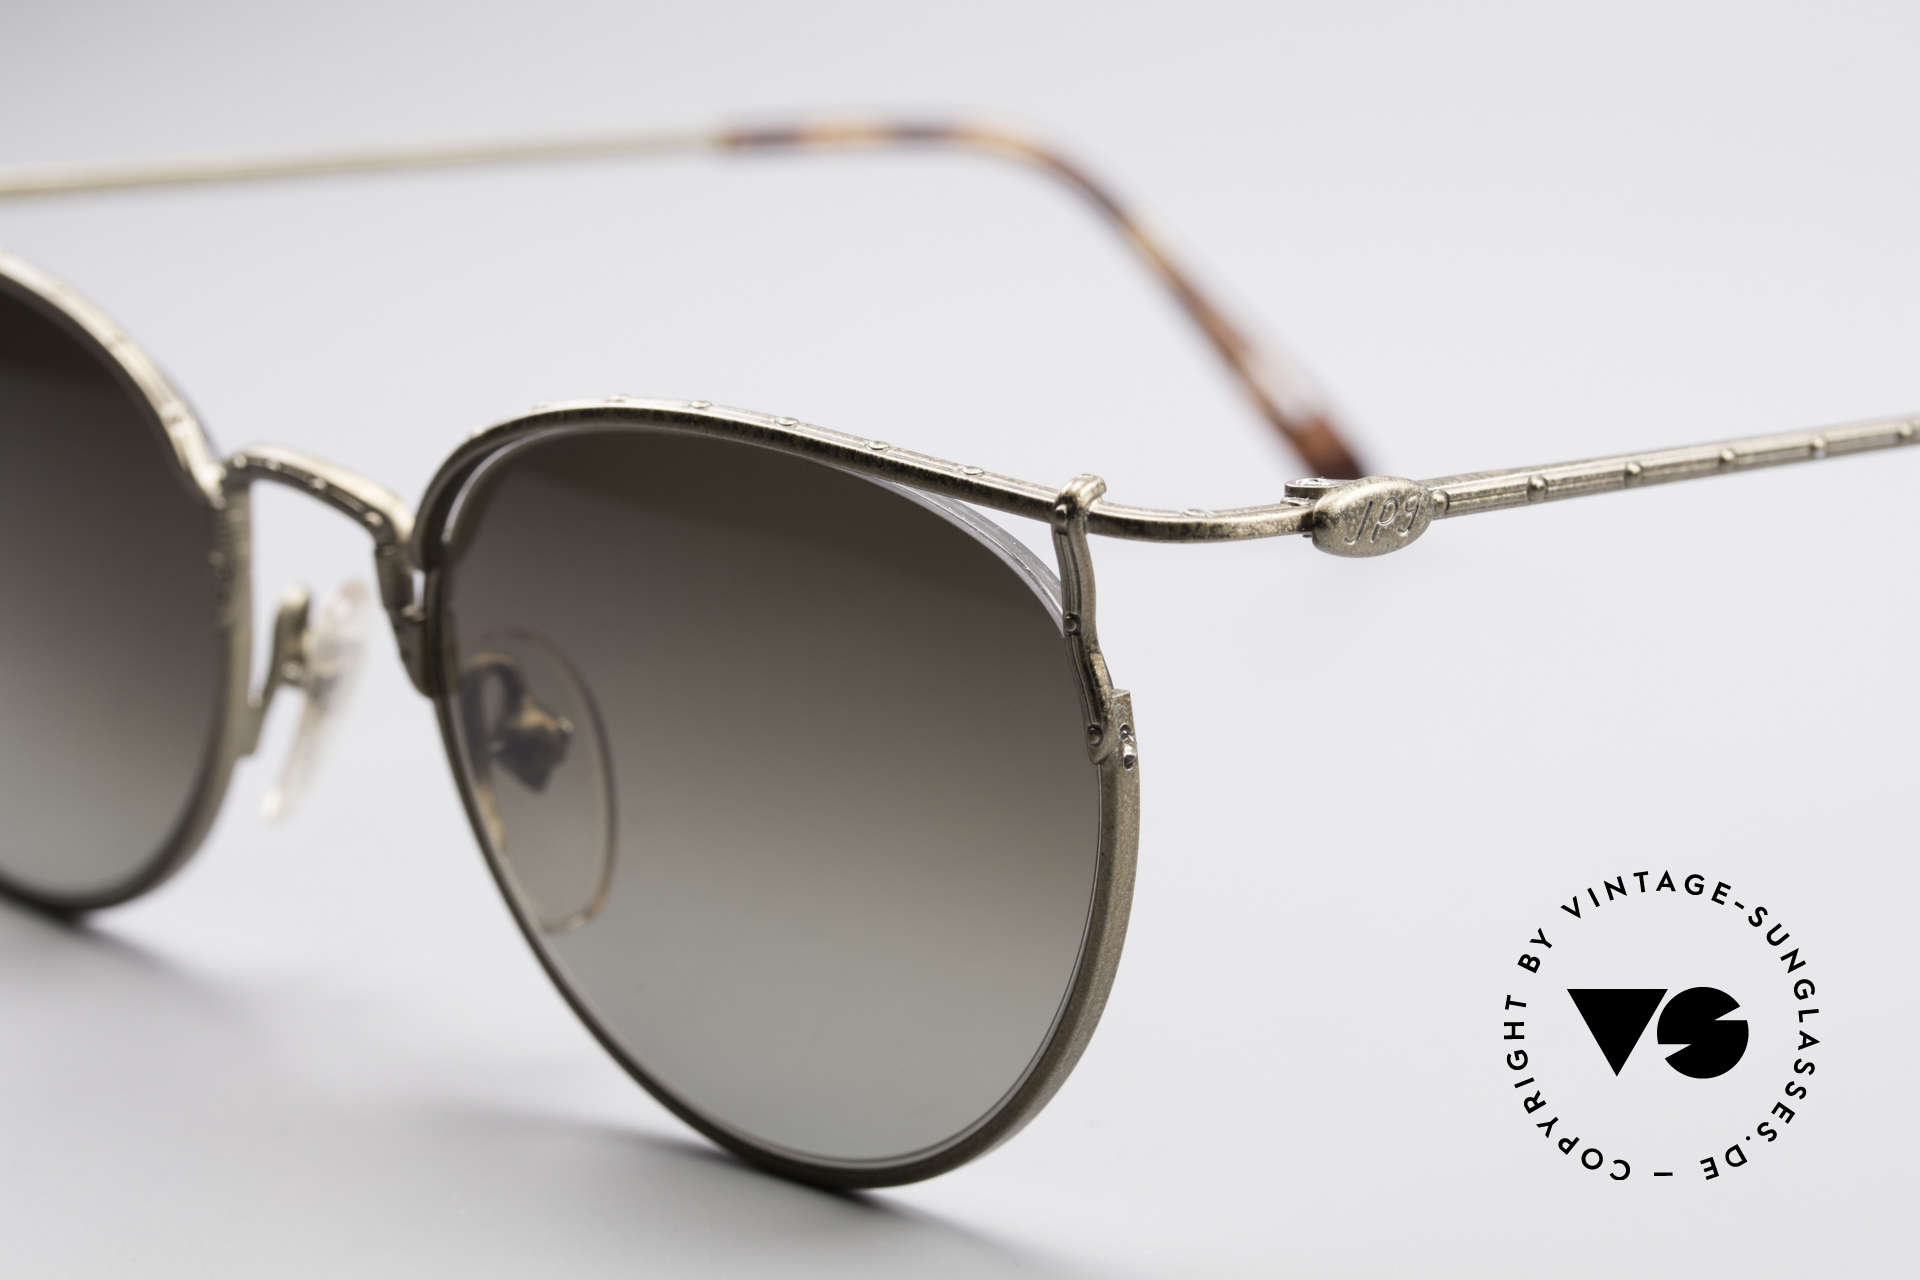 Jean Paul Gaultier 55-3177 Interesting Vintage Frame, dark brown-gradient sun lenses; 100% UV protec., Made for Men and Women